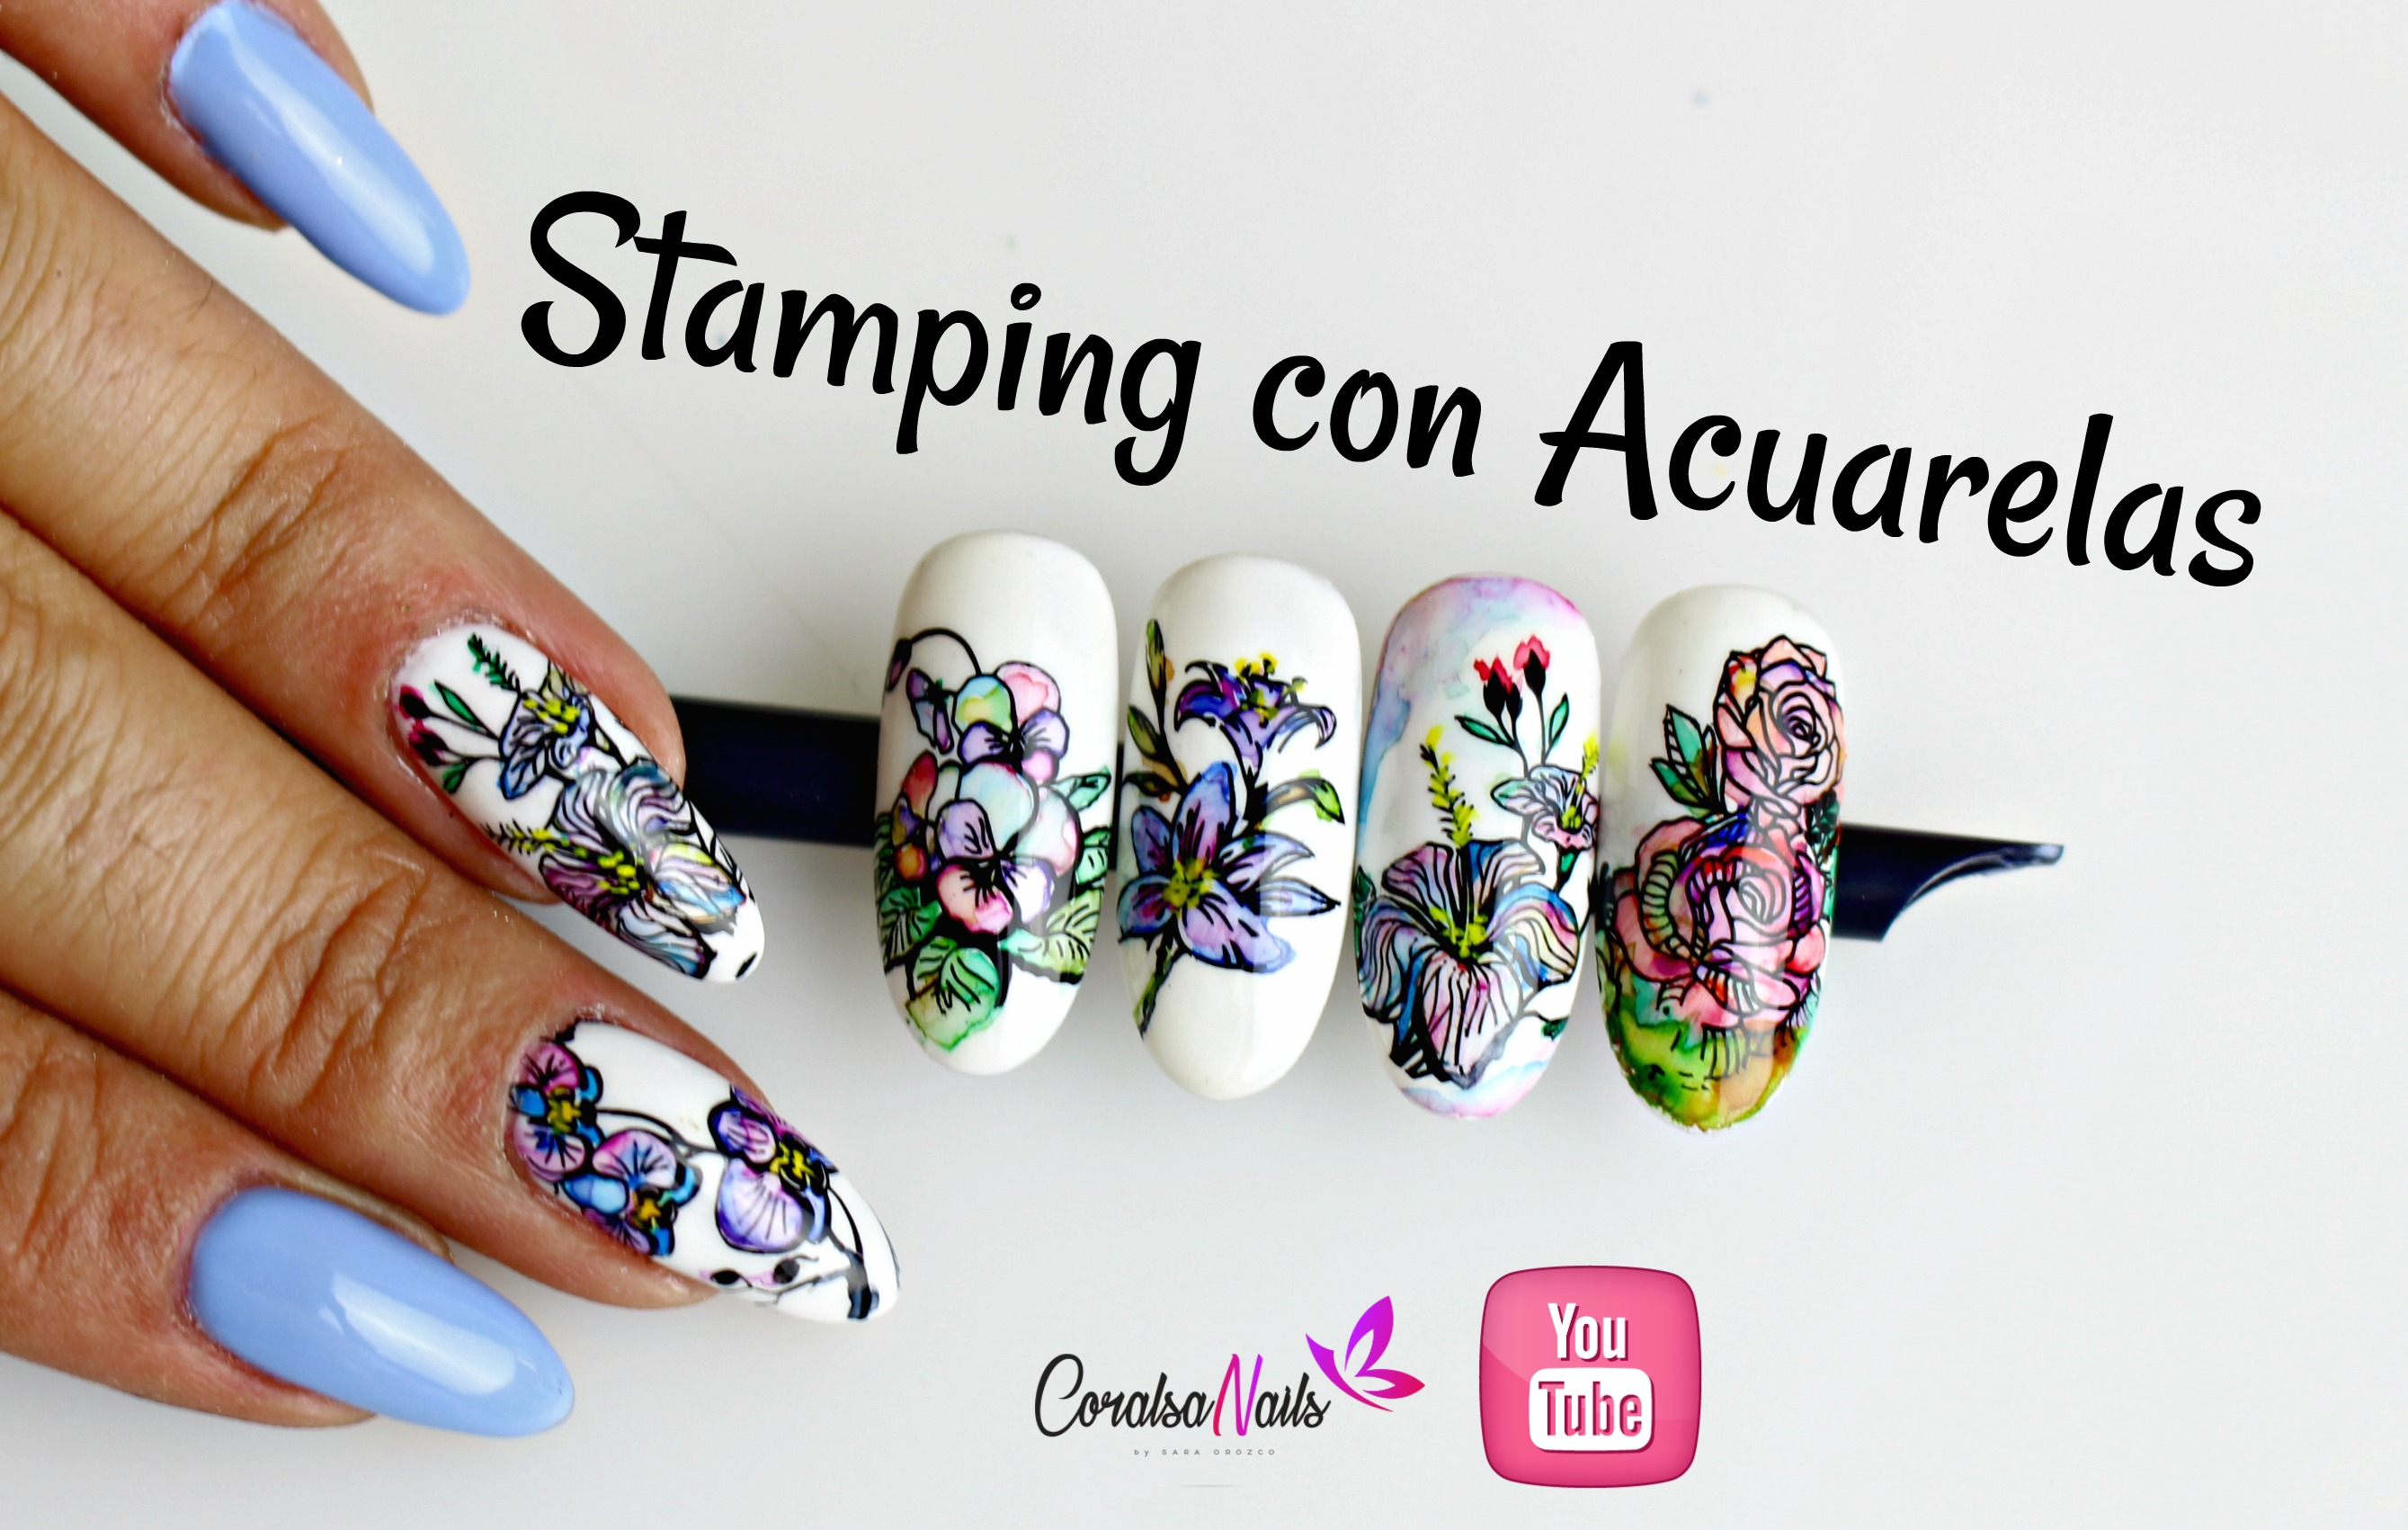 Stamping con Técnica de Acuarela